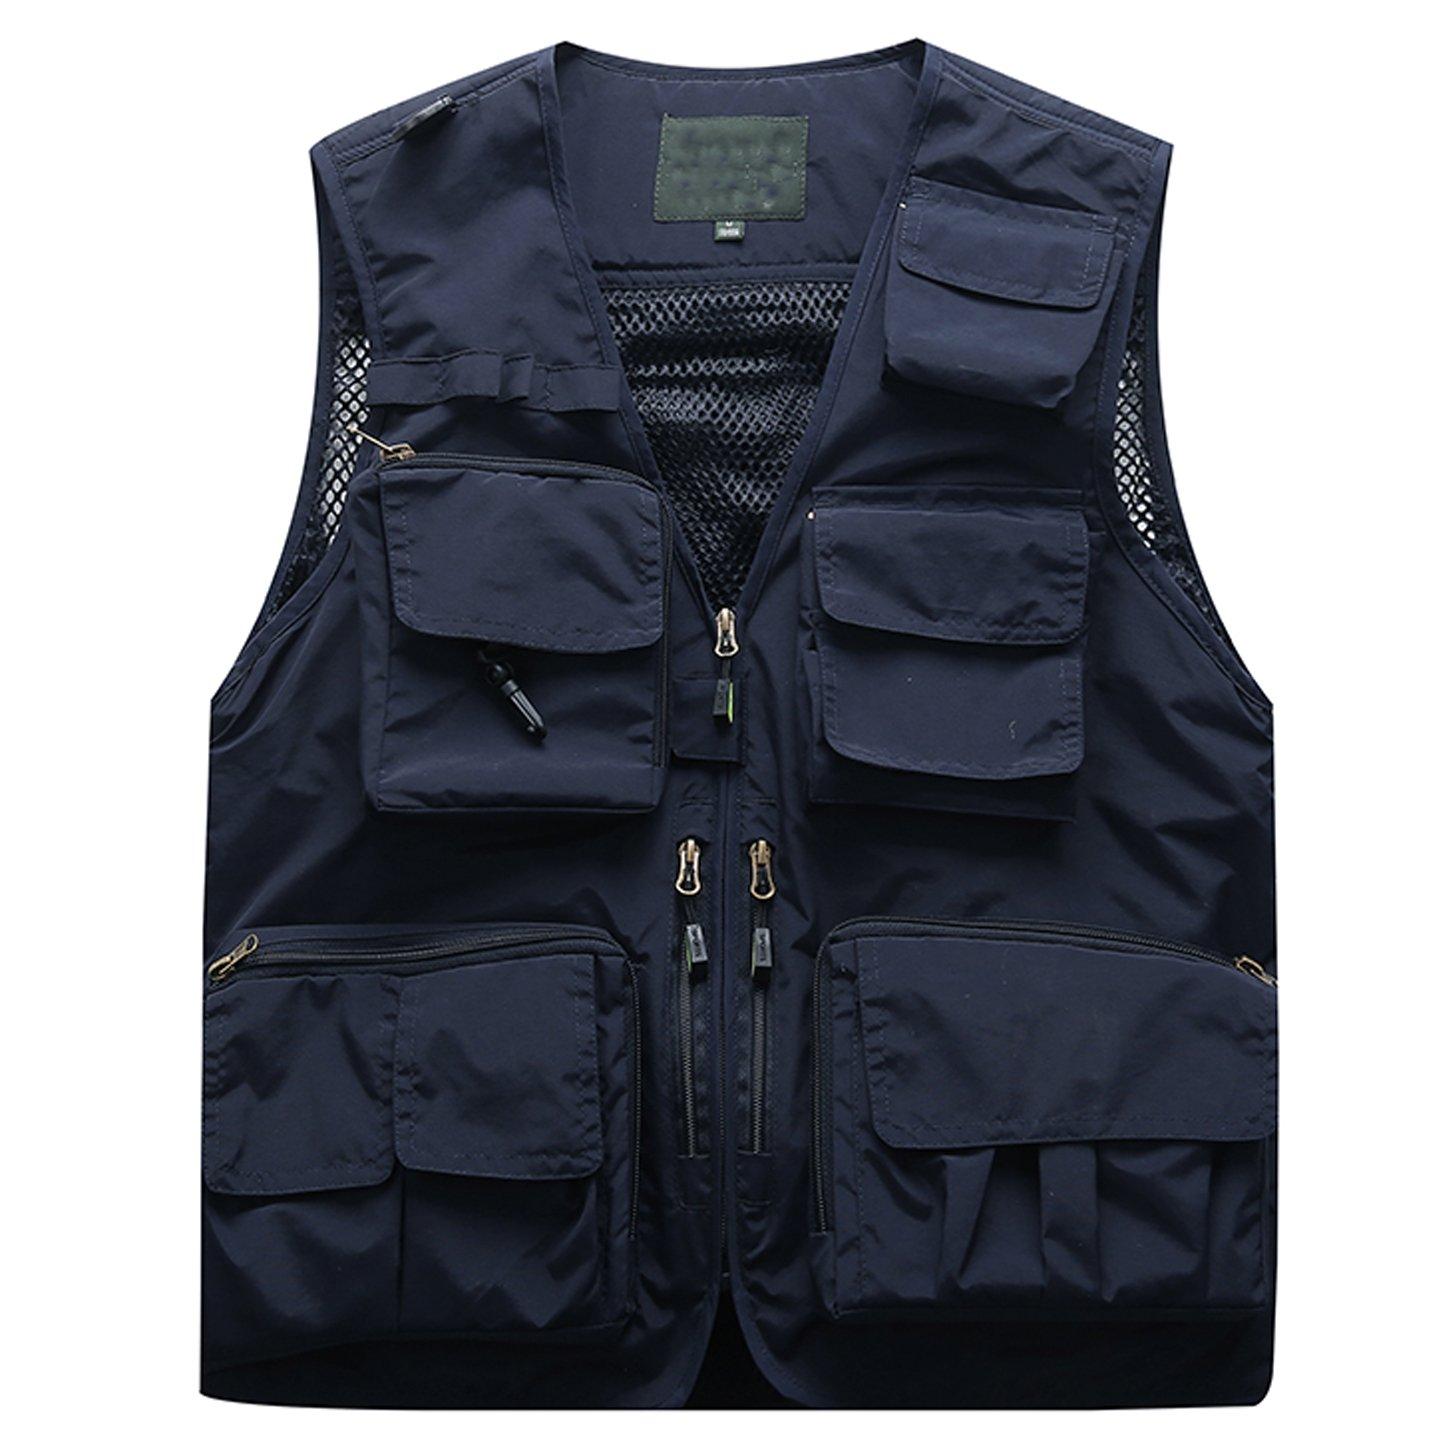 Flygo Men's Casual Lightweight Outdoor Travel Fishing Vest Jacket Multi Pockets (XXX-Large, Navy Blue) by Flygo